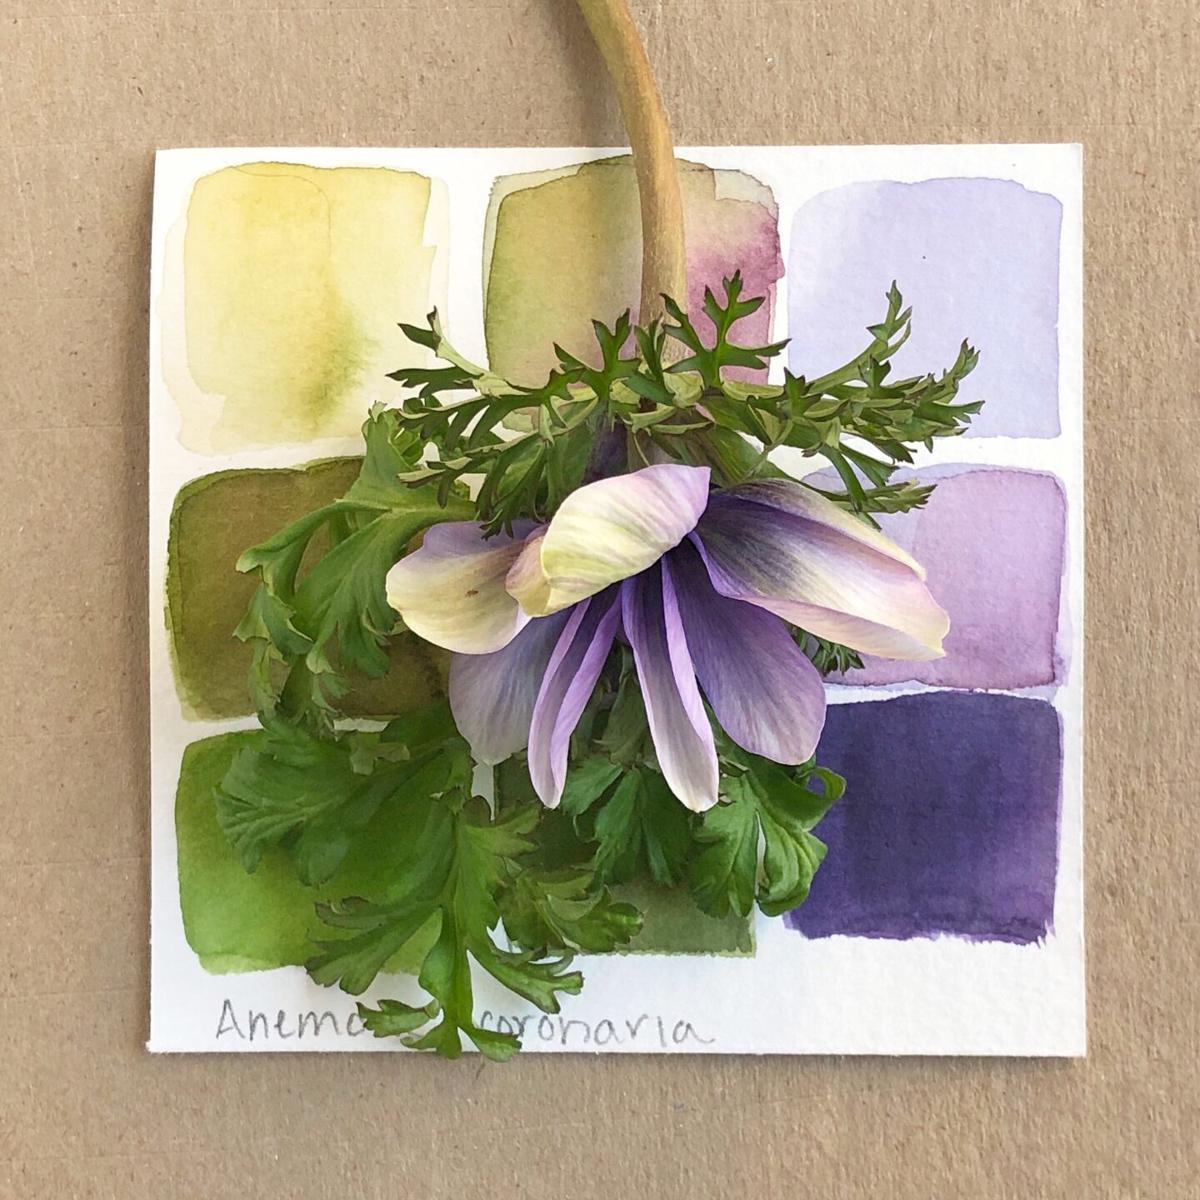 LIV - LAVGC Color in the Garden - Anemone.jpg